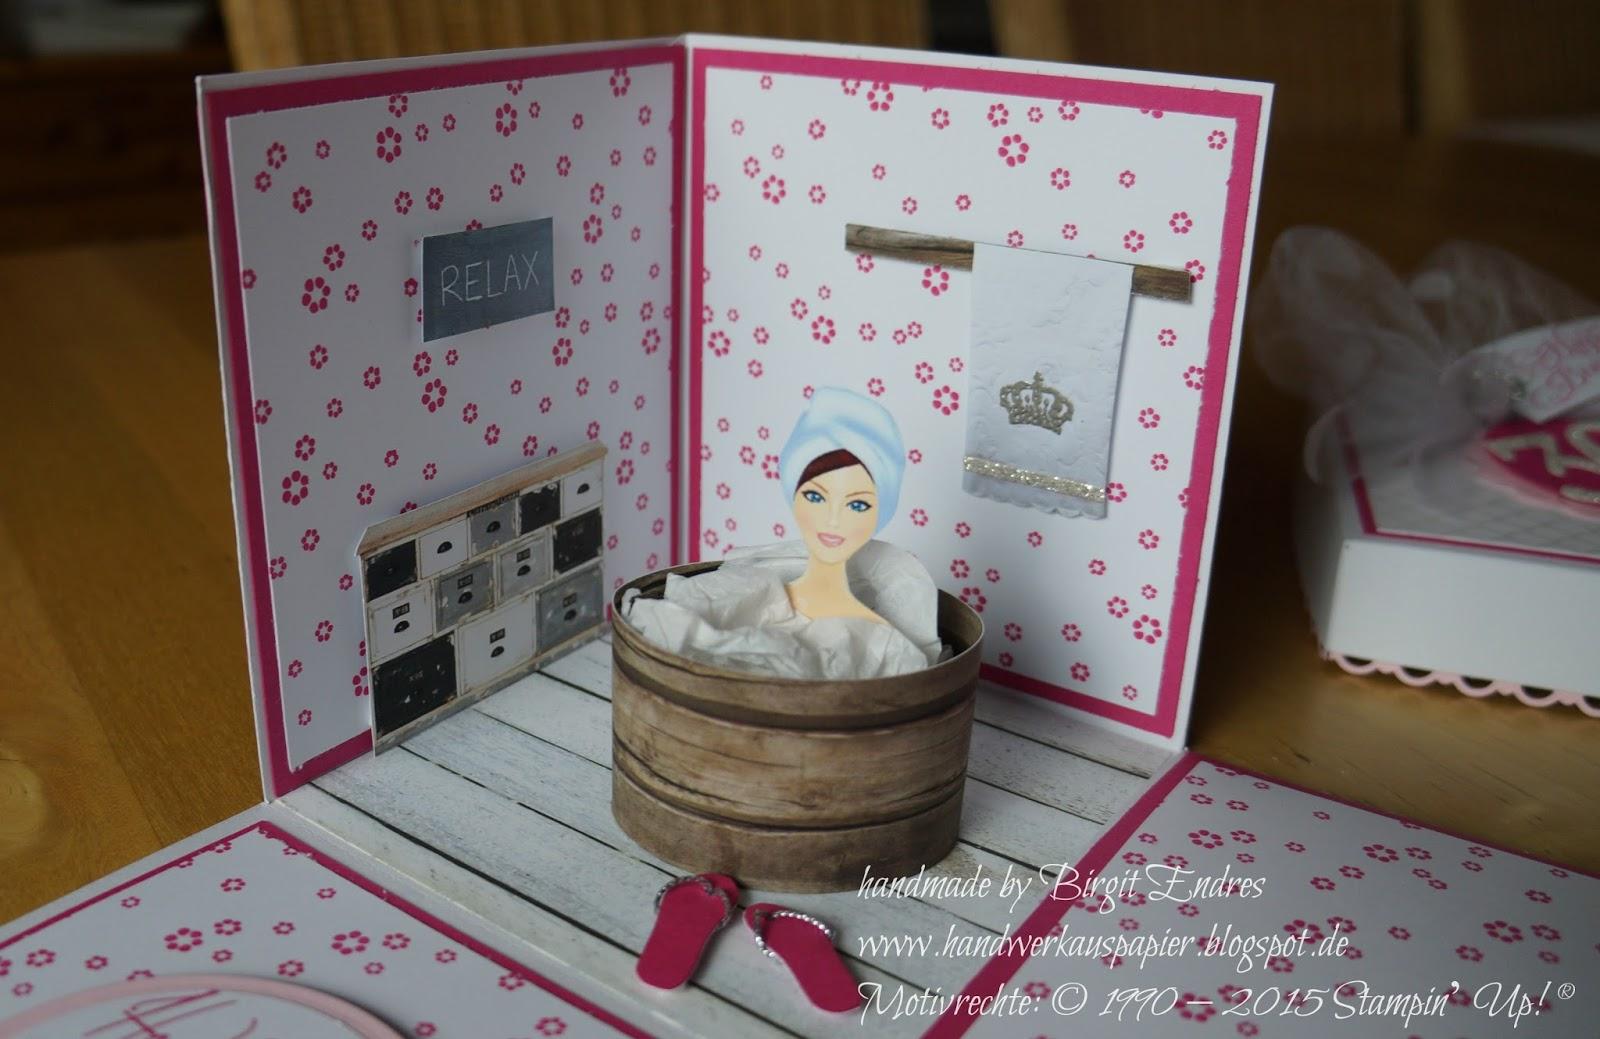 Handwerk aus papier wellness explosionsbox - Gutschein originell verpacken tipps oder ideen ...